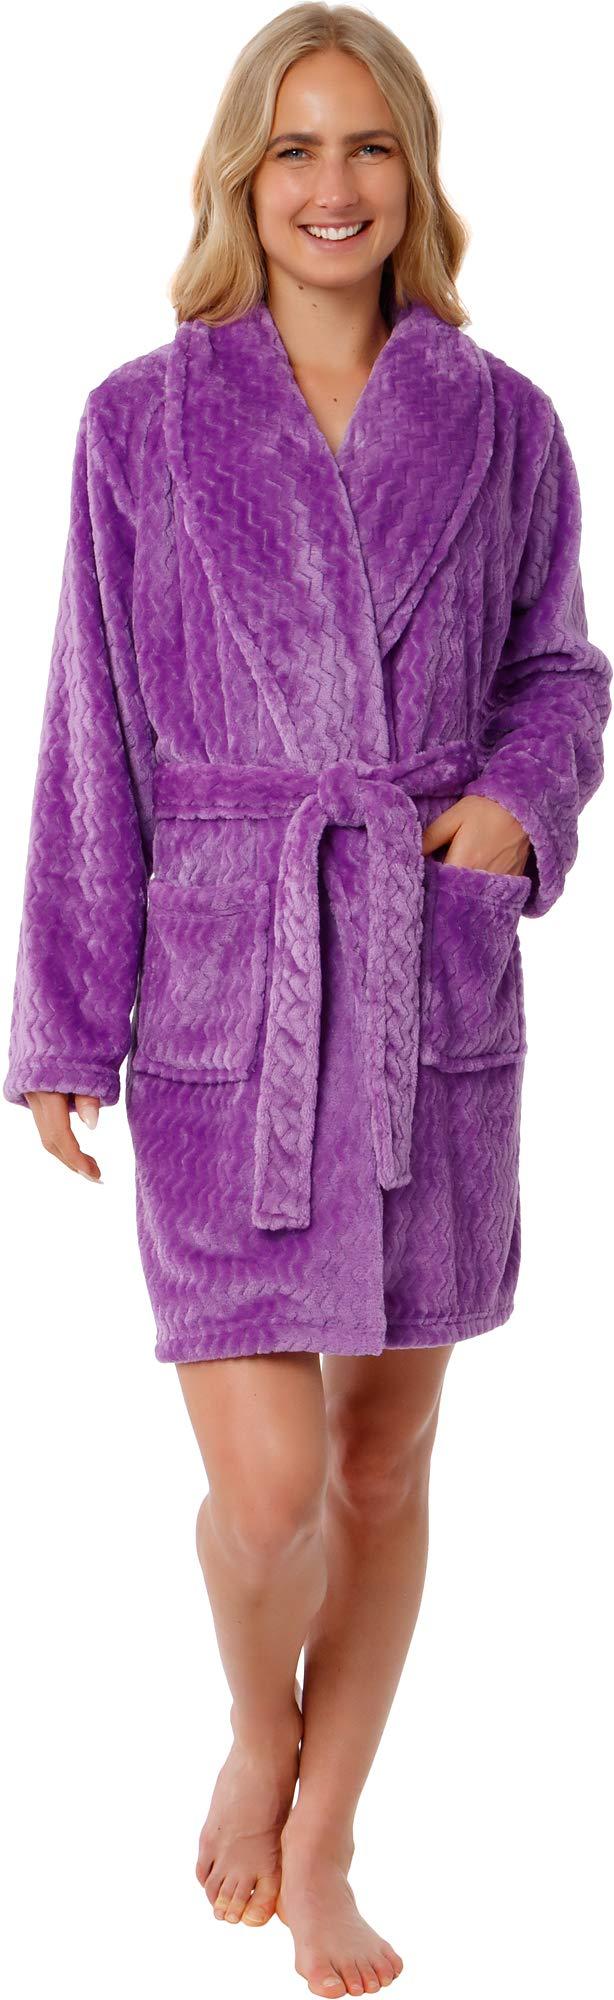 Silver Lilly Women's Embossed Robe - Plush Fleece Chevron Coral Textured Short Kimono Bathrobe